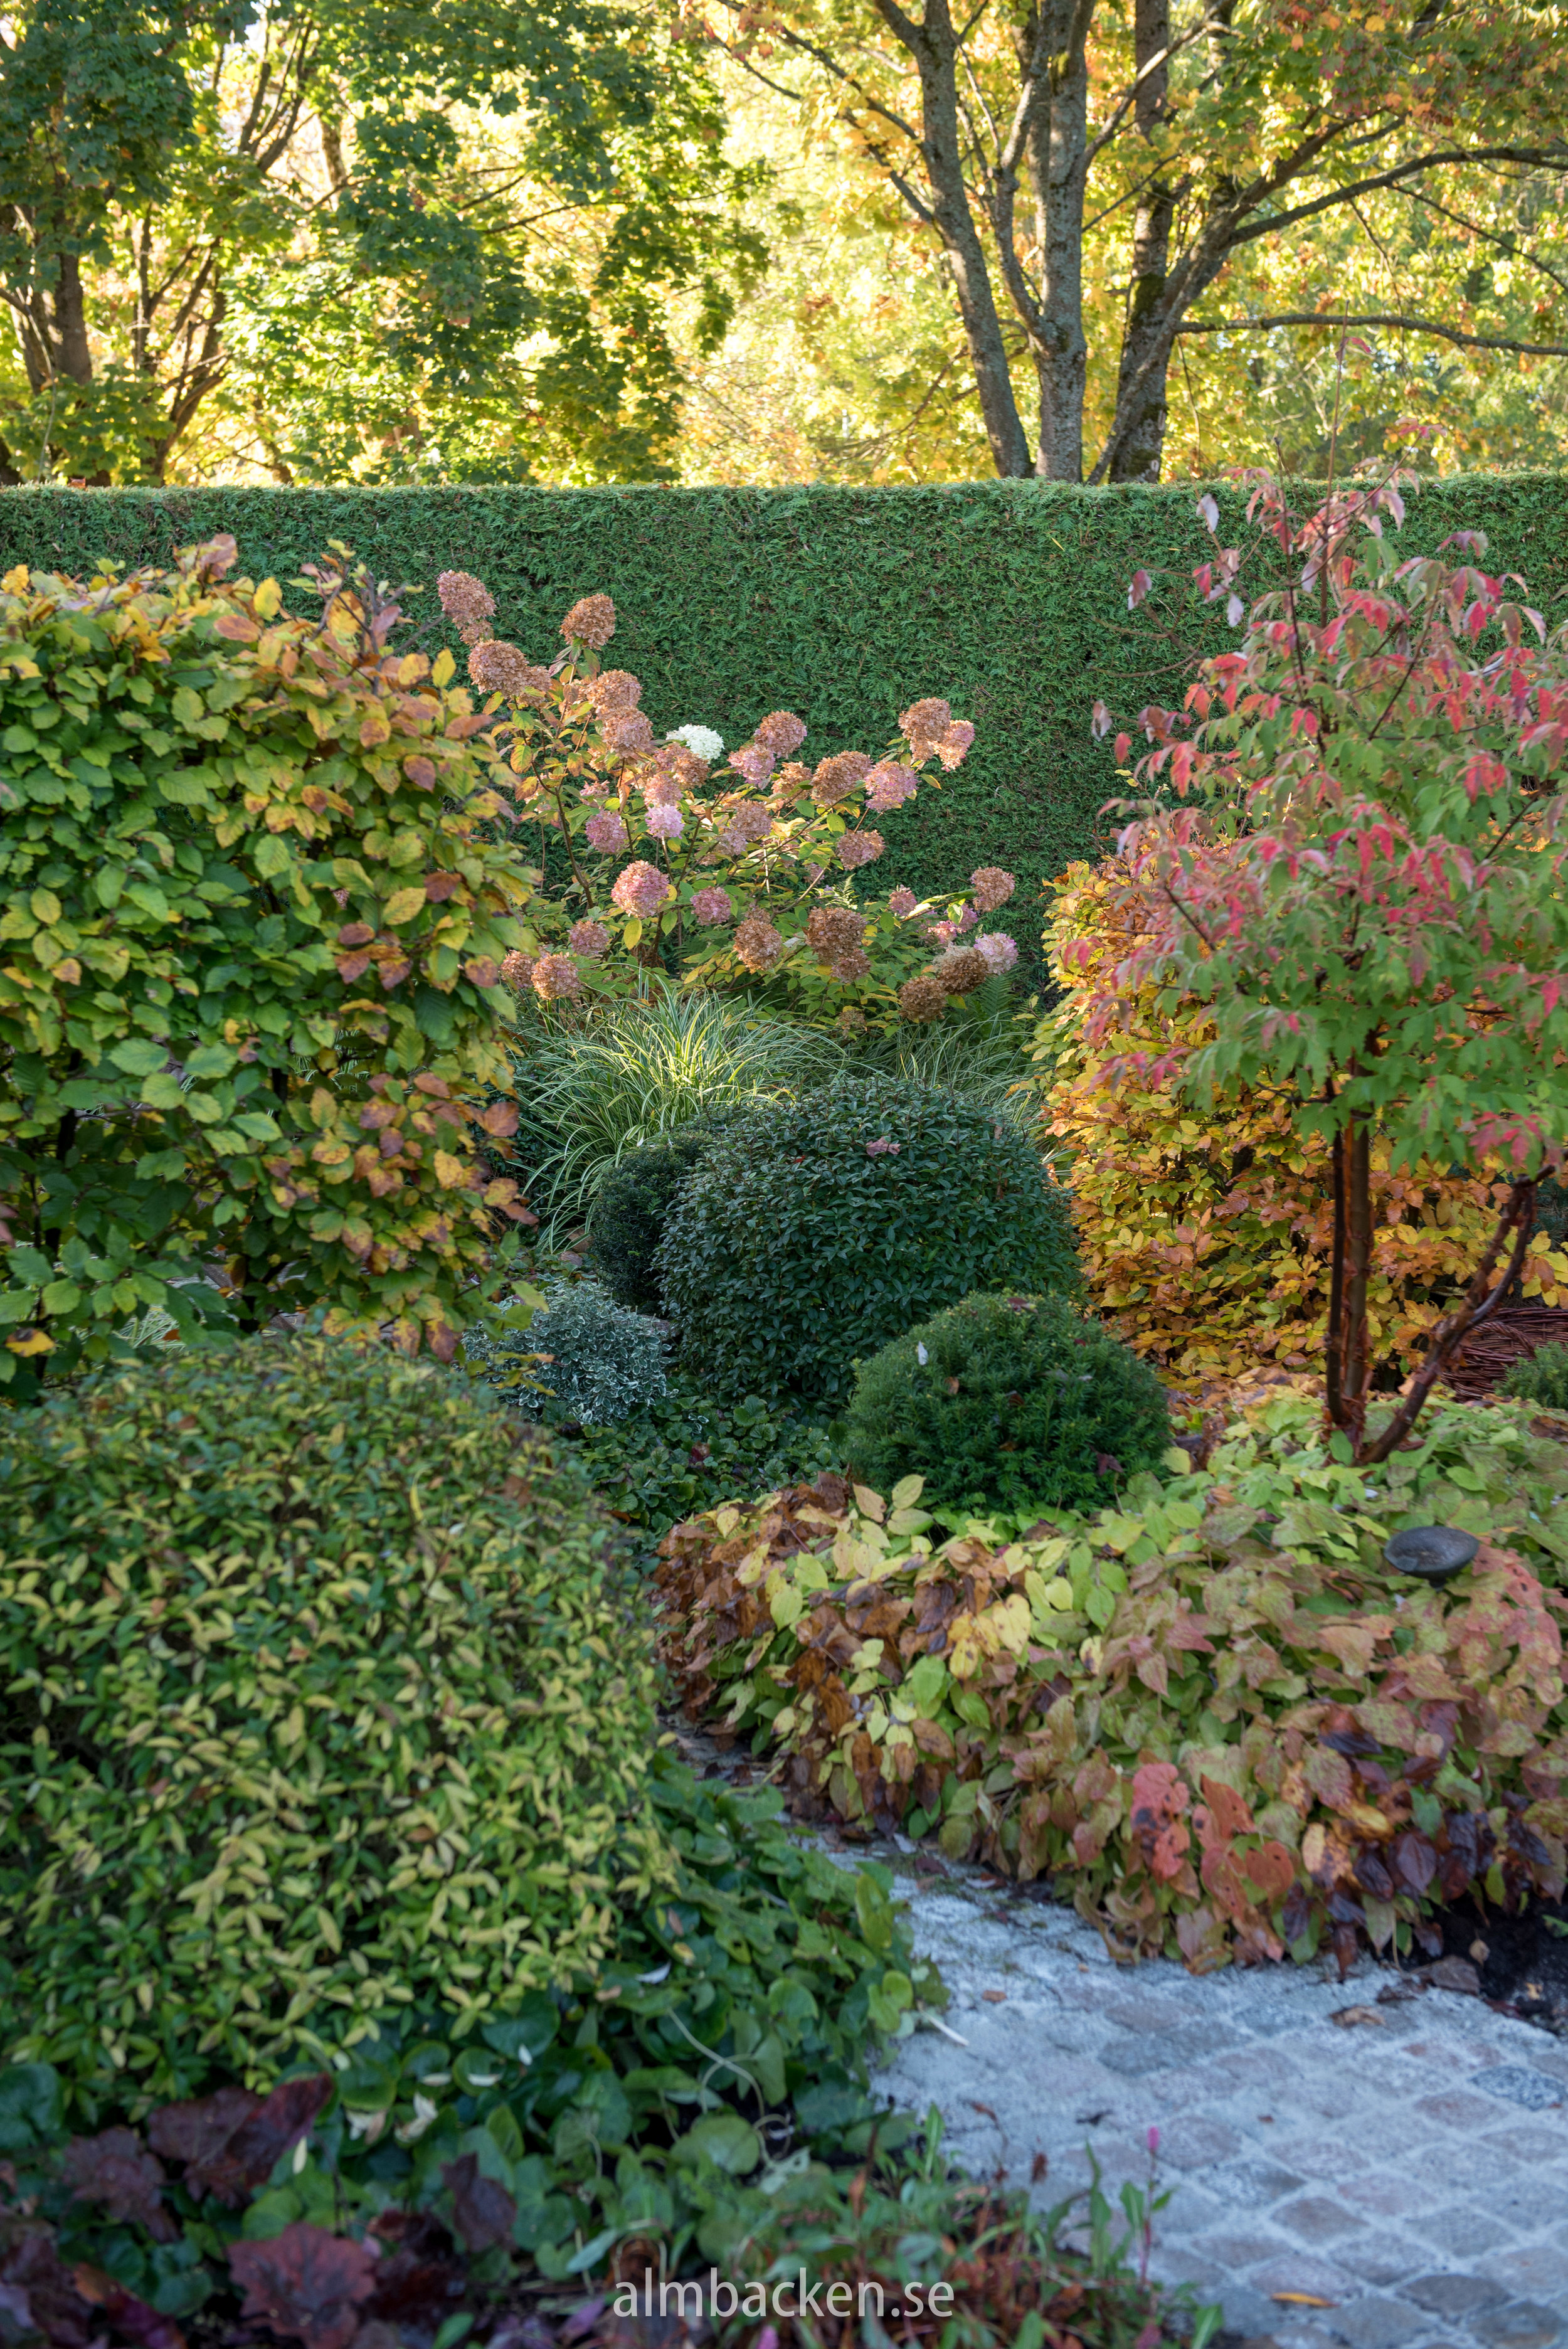 Ligusterklot (Ligustrum vulgare), kopparlönn (Acer griseum), röd sockblomma (Epimedium x rubrum) och hortensia 'Limelight' (Hydrangea Paniculata 'LImelight')